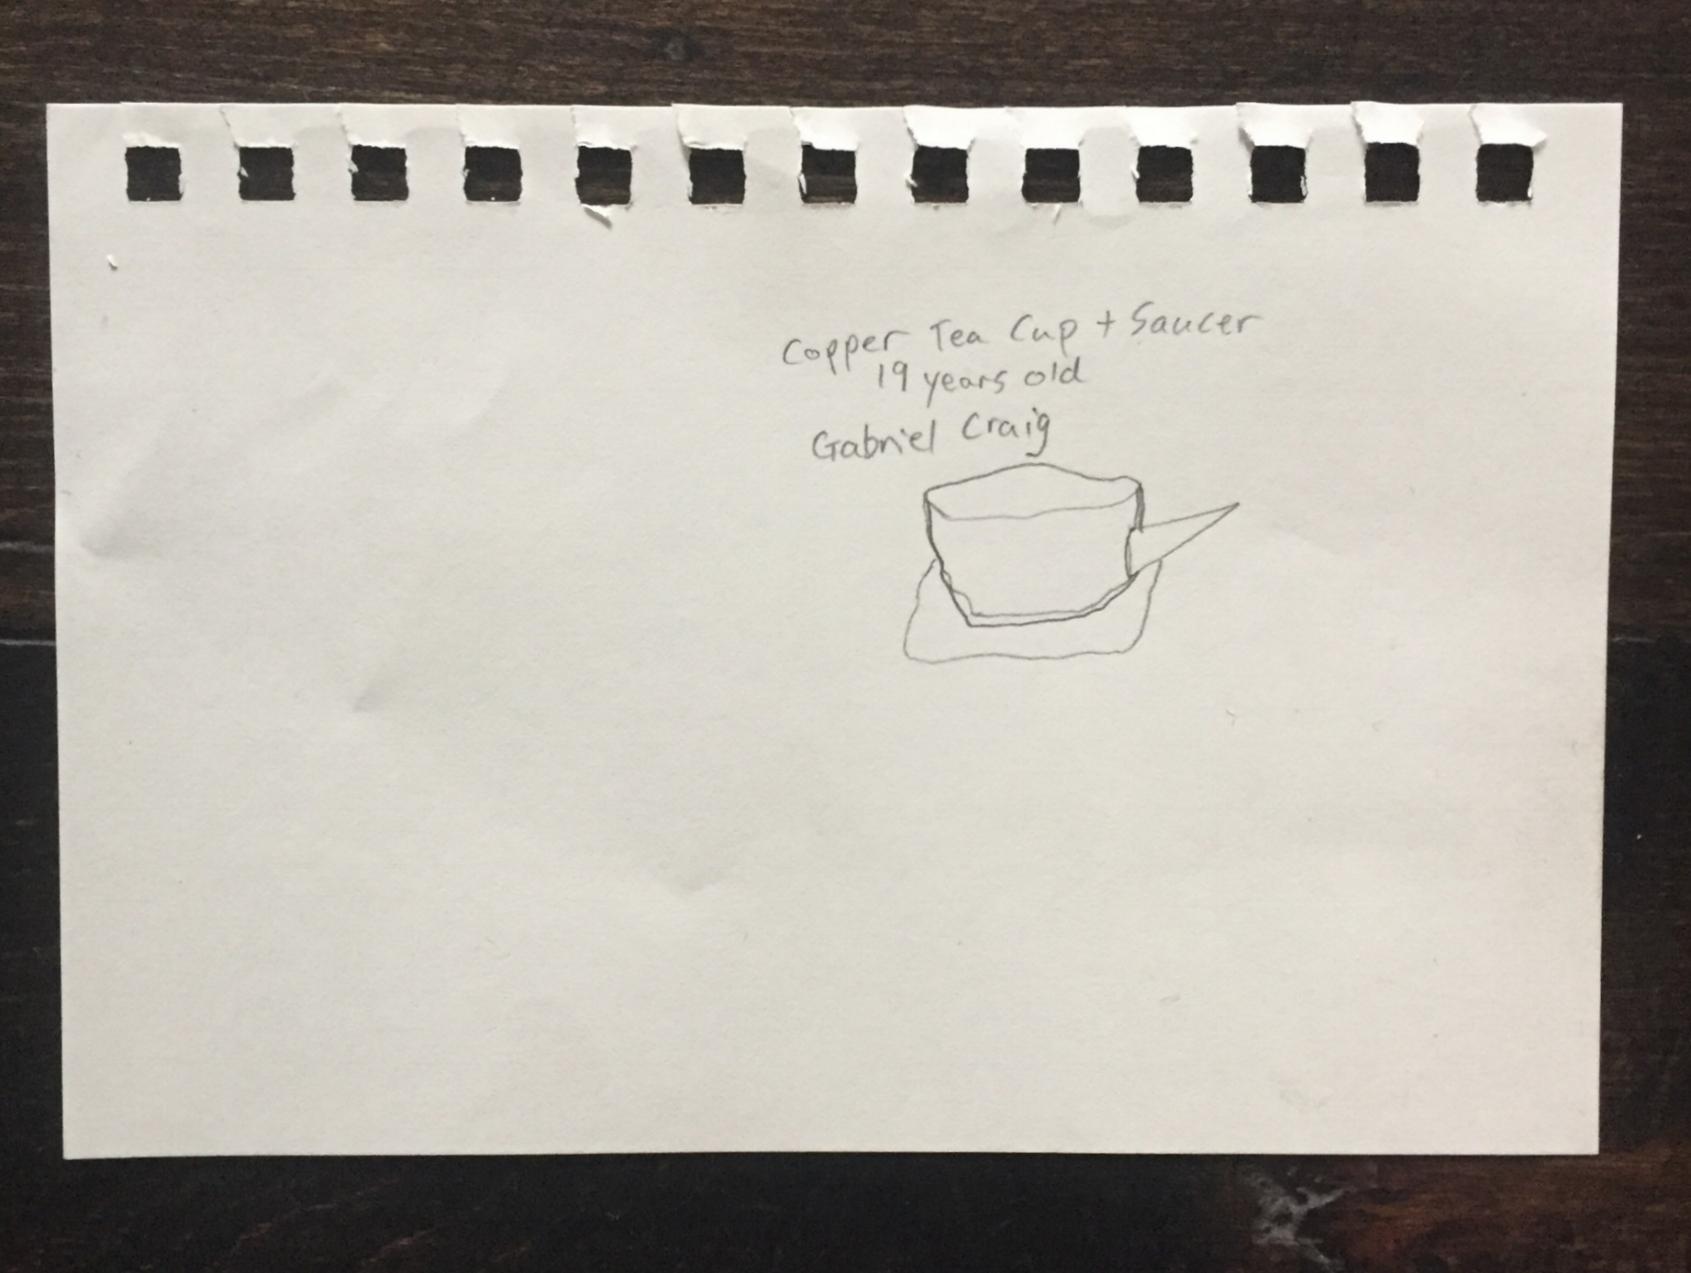 Gabriel's First Make: A teacup, Age 19.